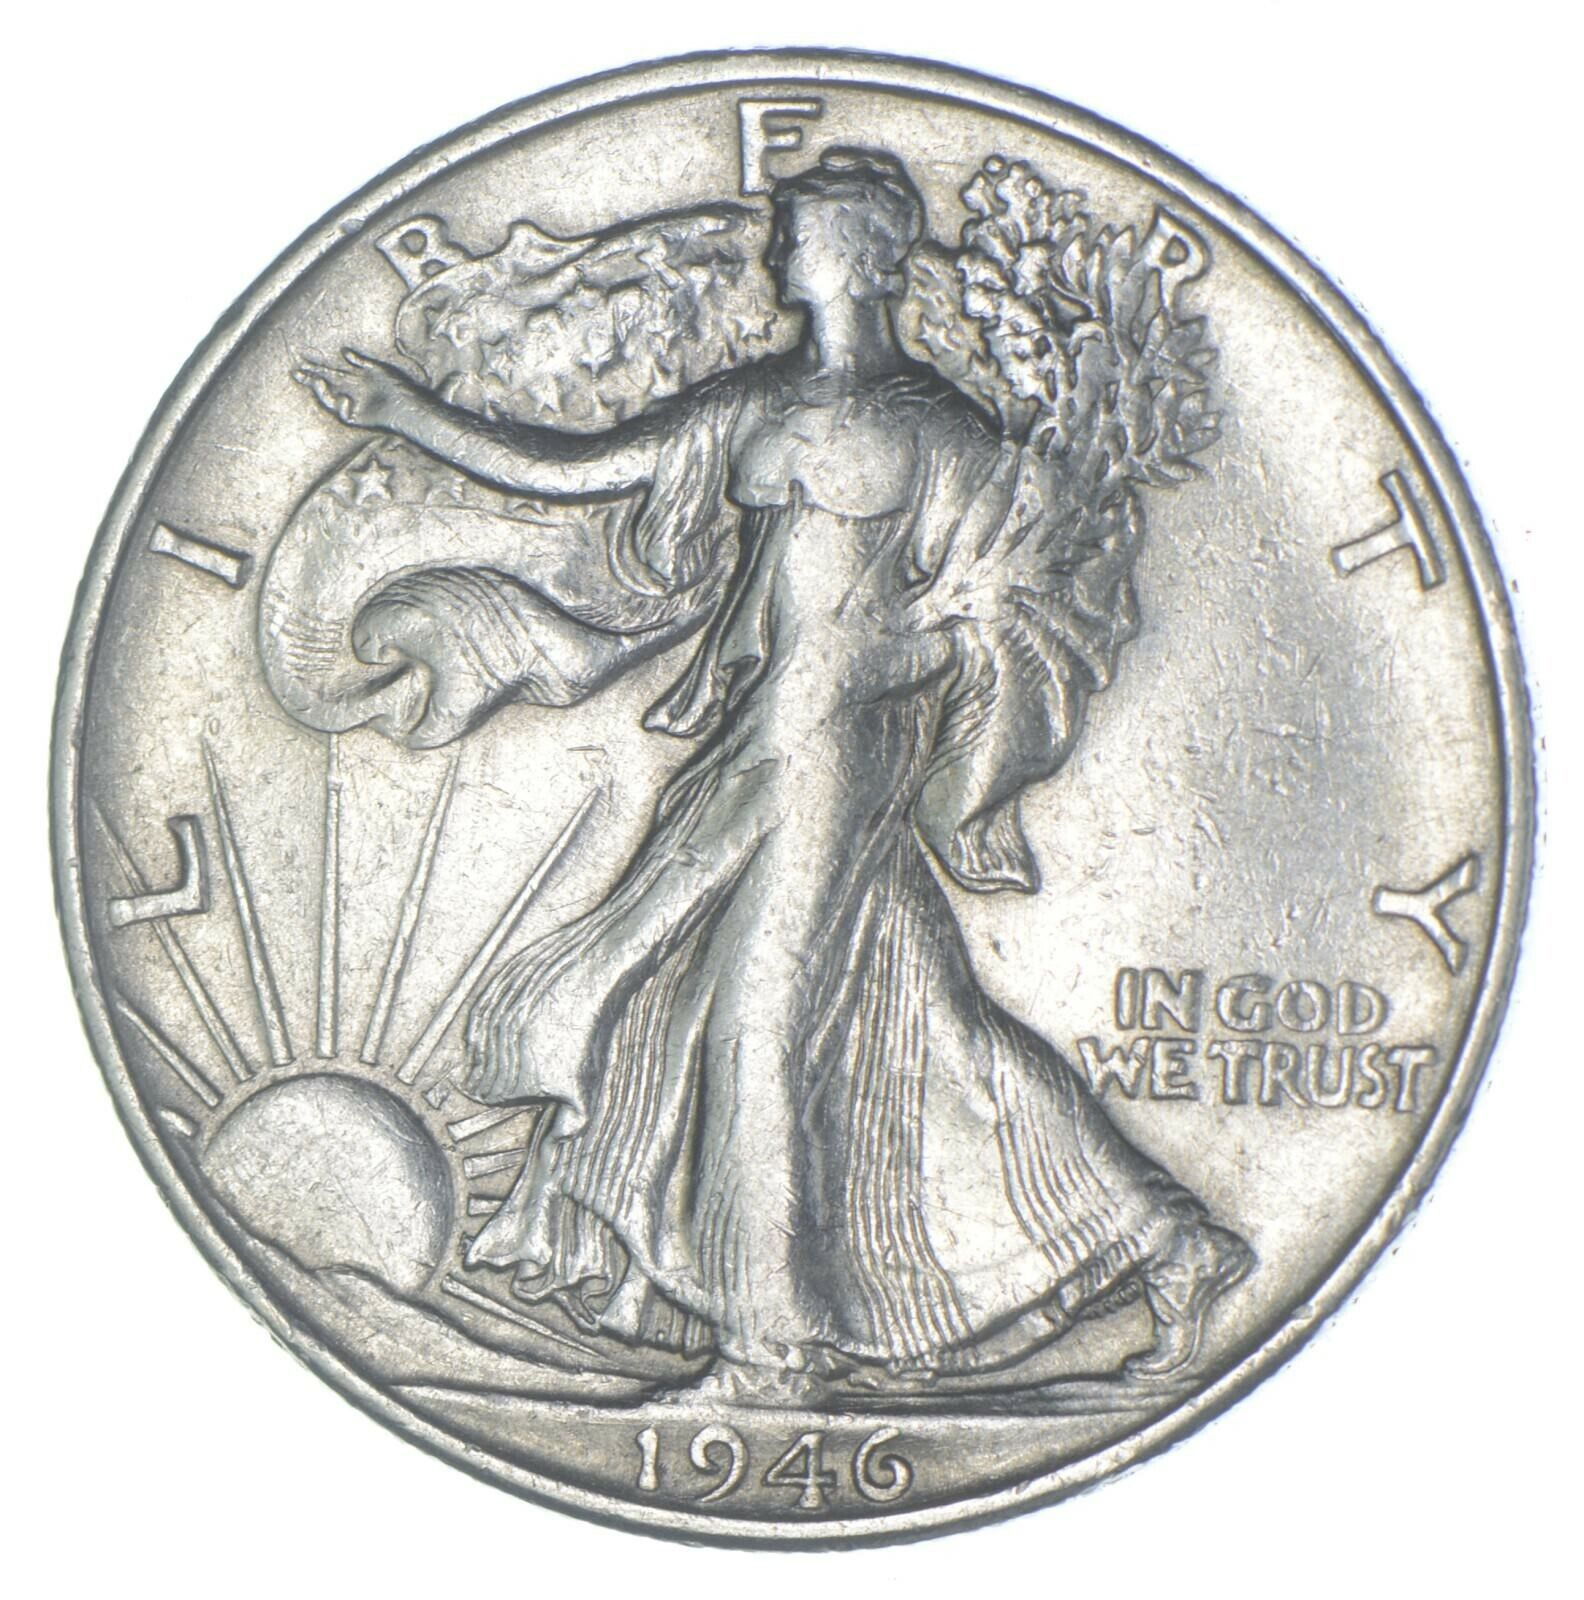 AU/Unc - 1946-S Walking Liberty Silver Half Dollar - Better 220 - $16.50